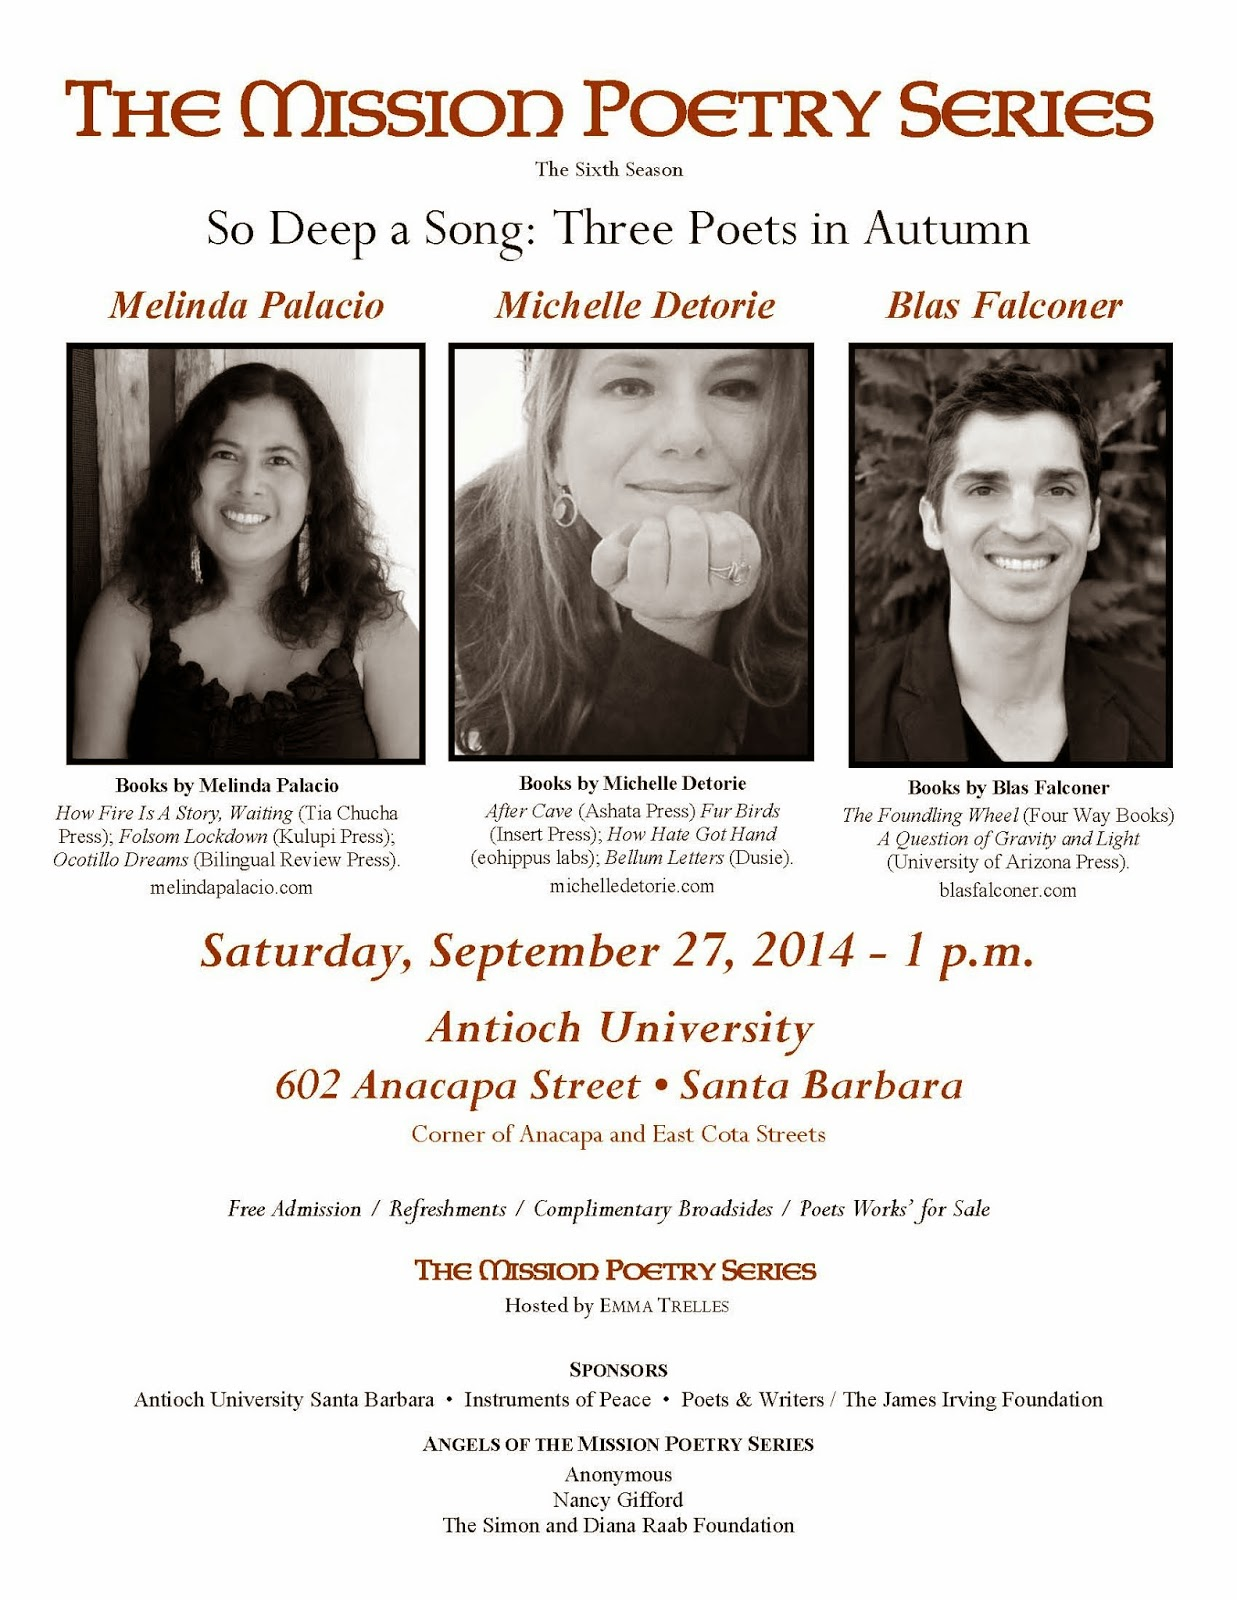 The Reading Will Be Held At Antioch University Santa Barbara €� 602 Anacapa  Street €� Santa Barbara, Ca, And Is Free And Open To The Public